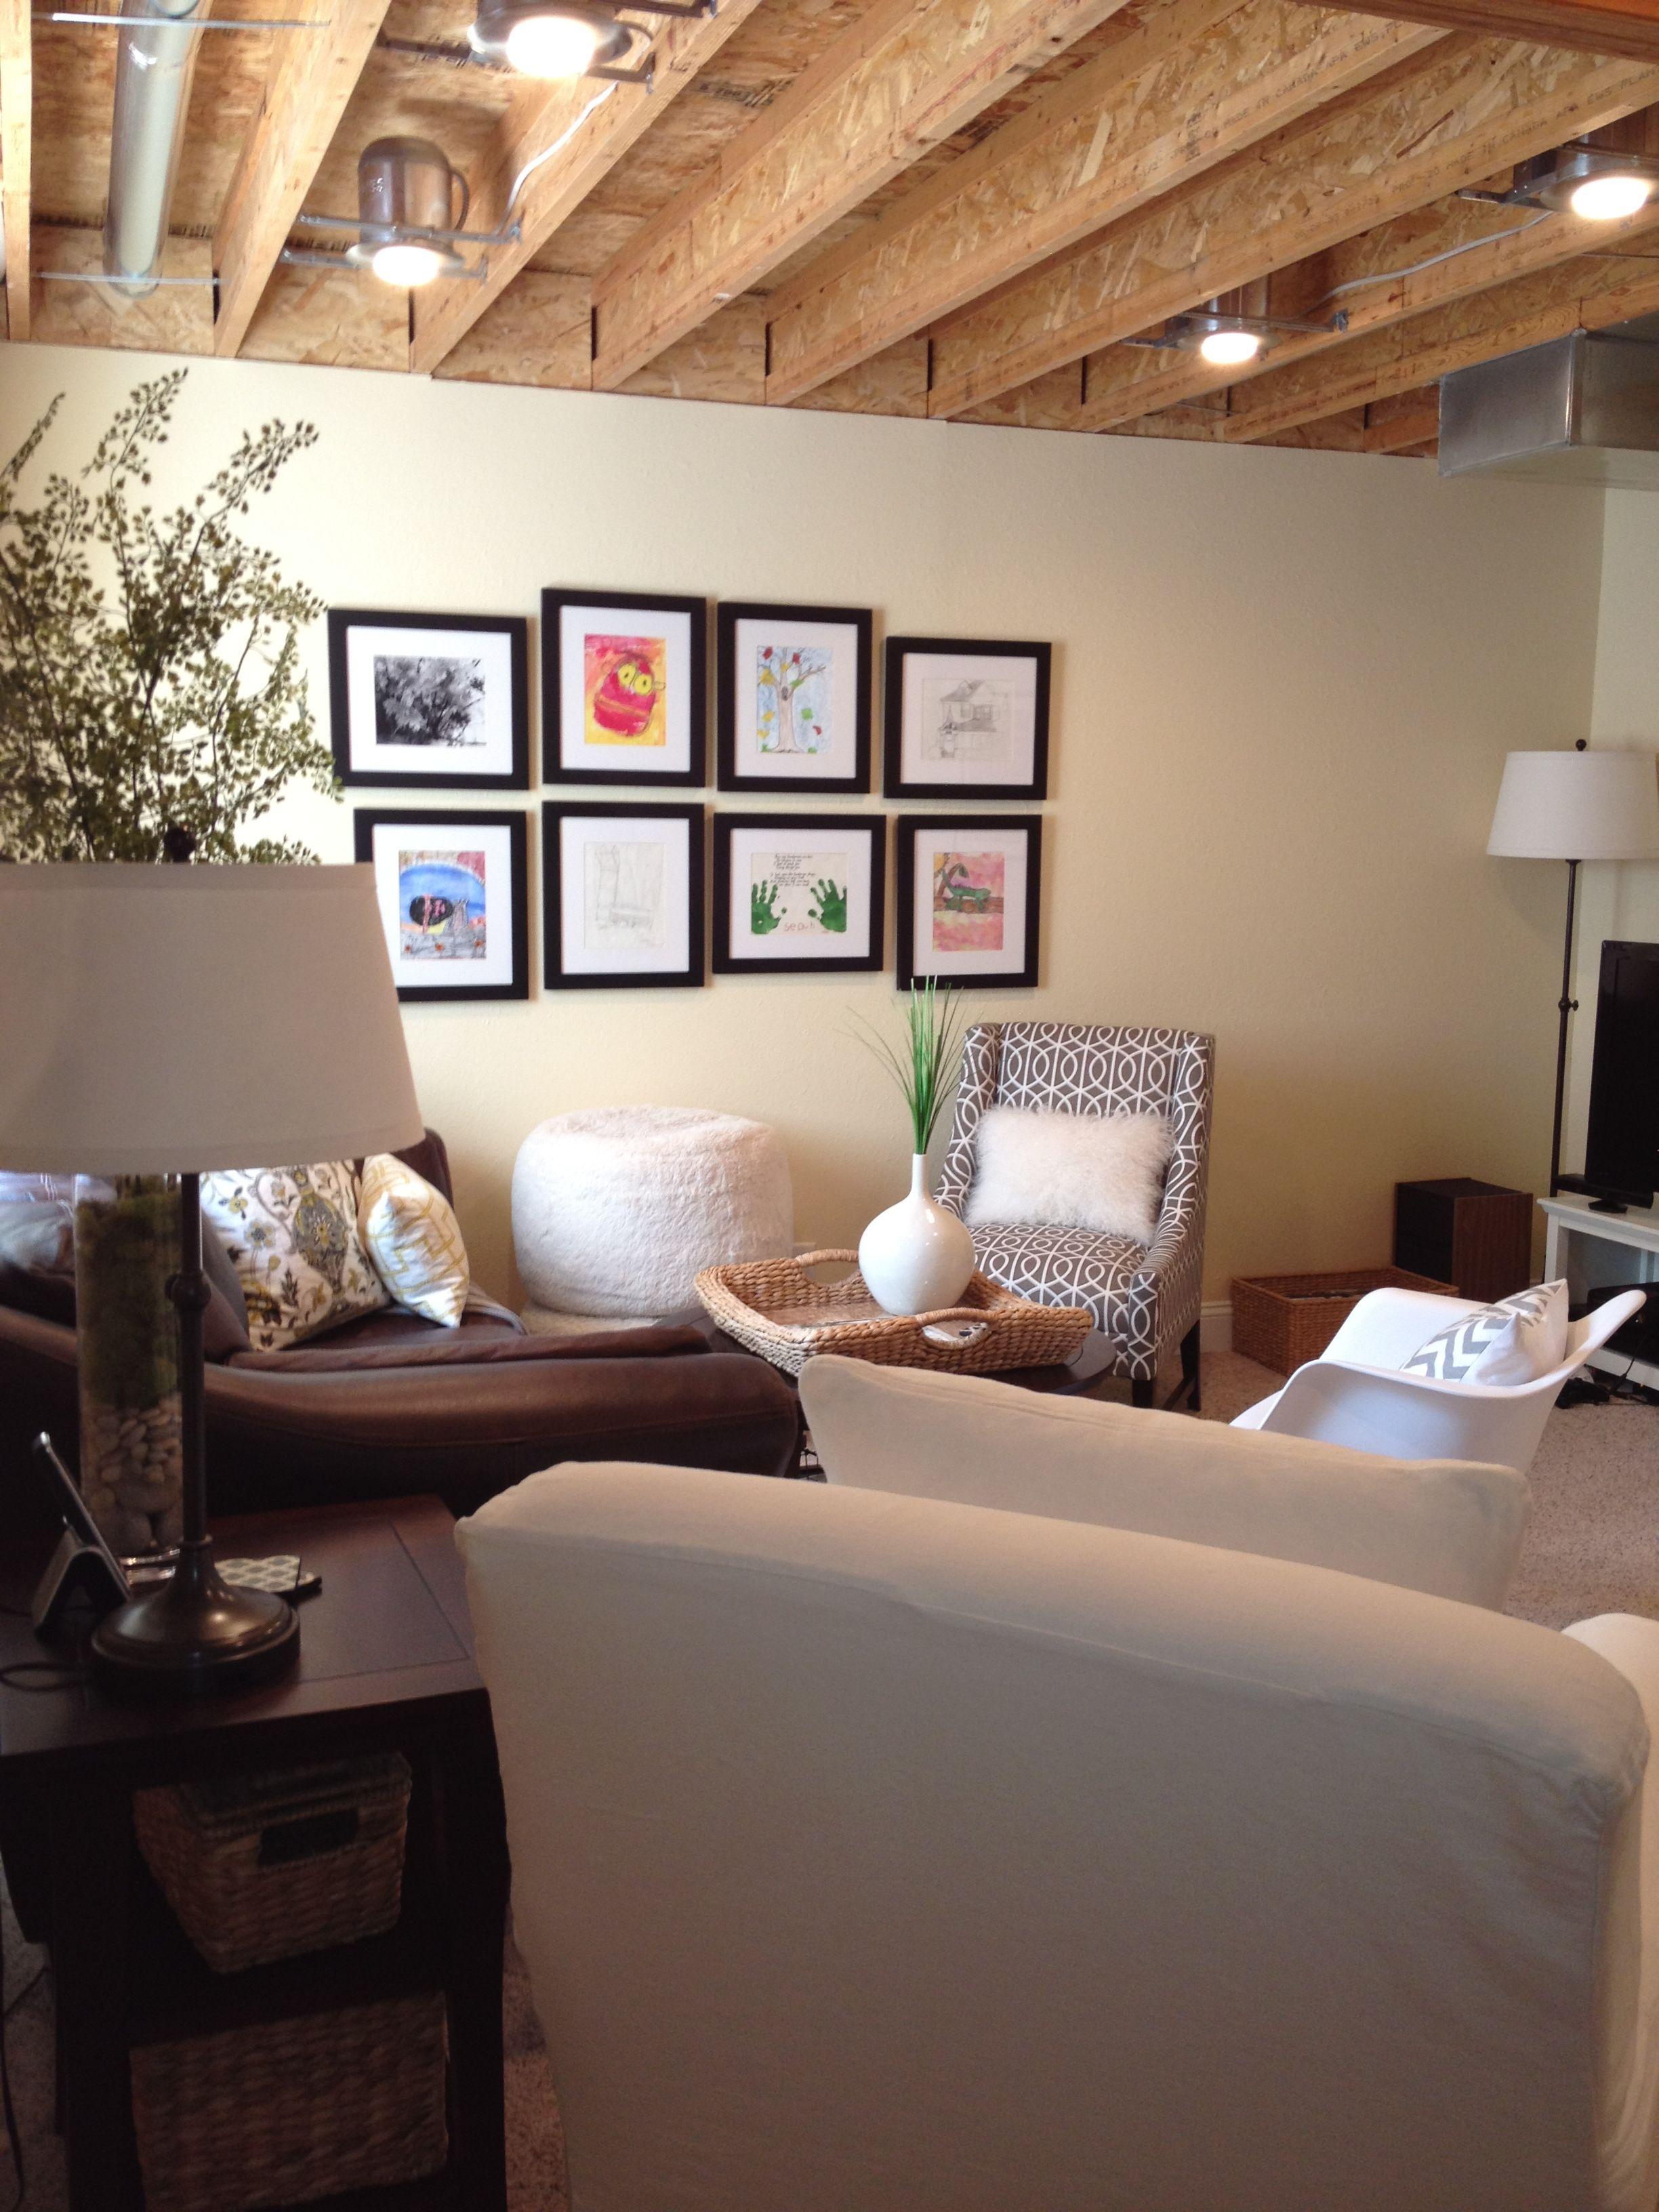 20 Amazing Unfinished Basement Ideas You Should Try Unfinished Basement Walls Low Ceiling Basement Basement Lighting